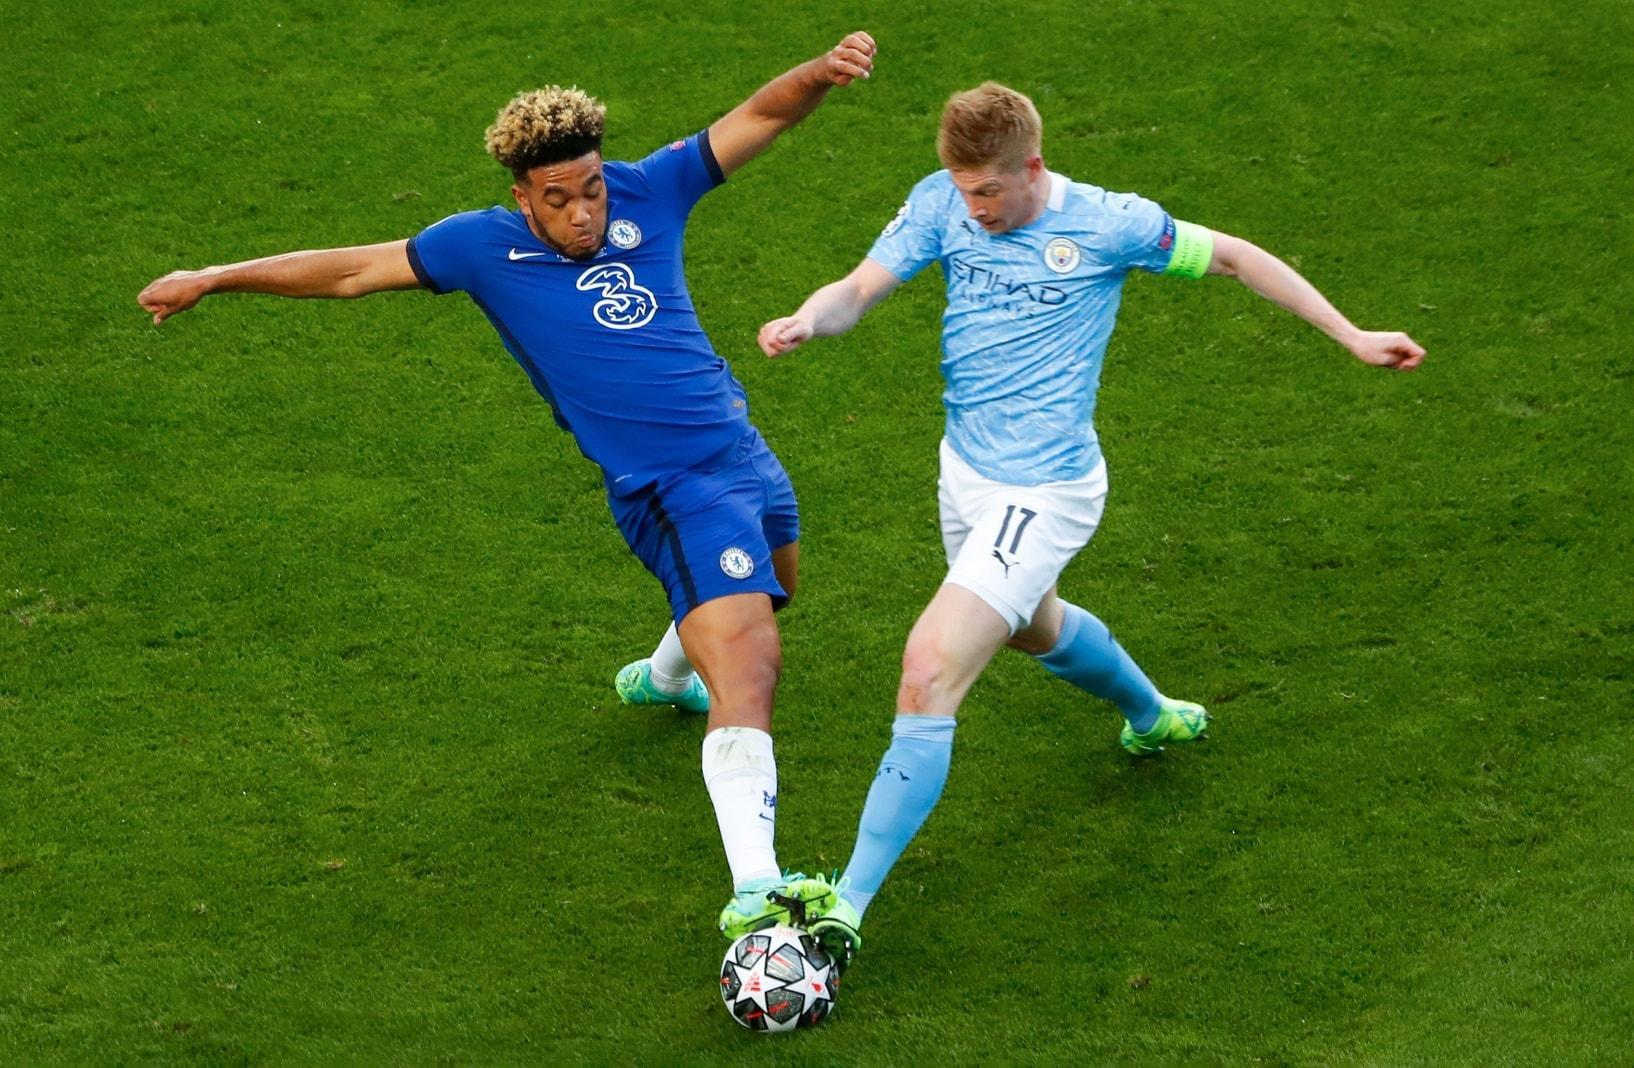 Manchester City - FC Chelsea De Bruyne